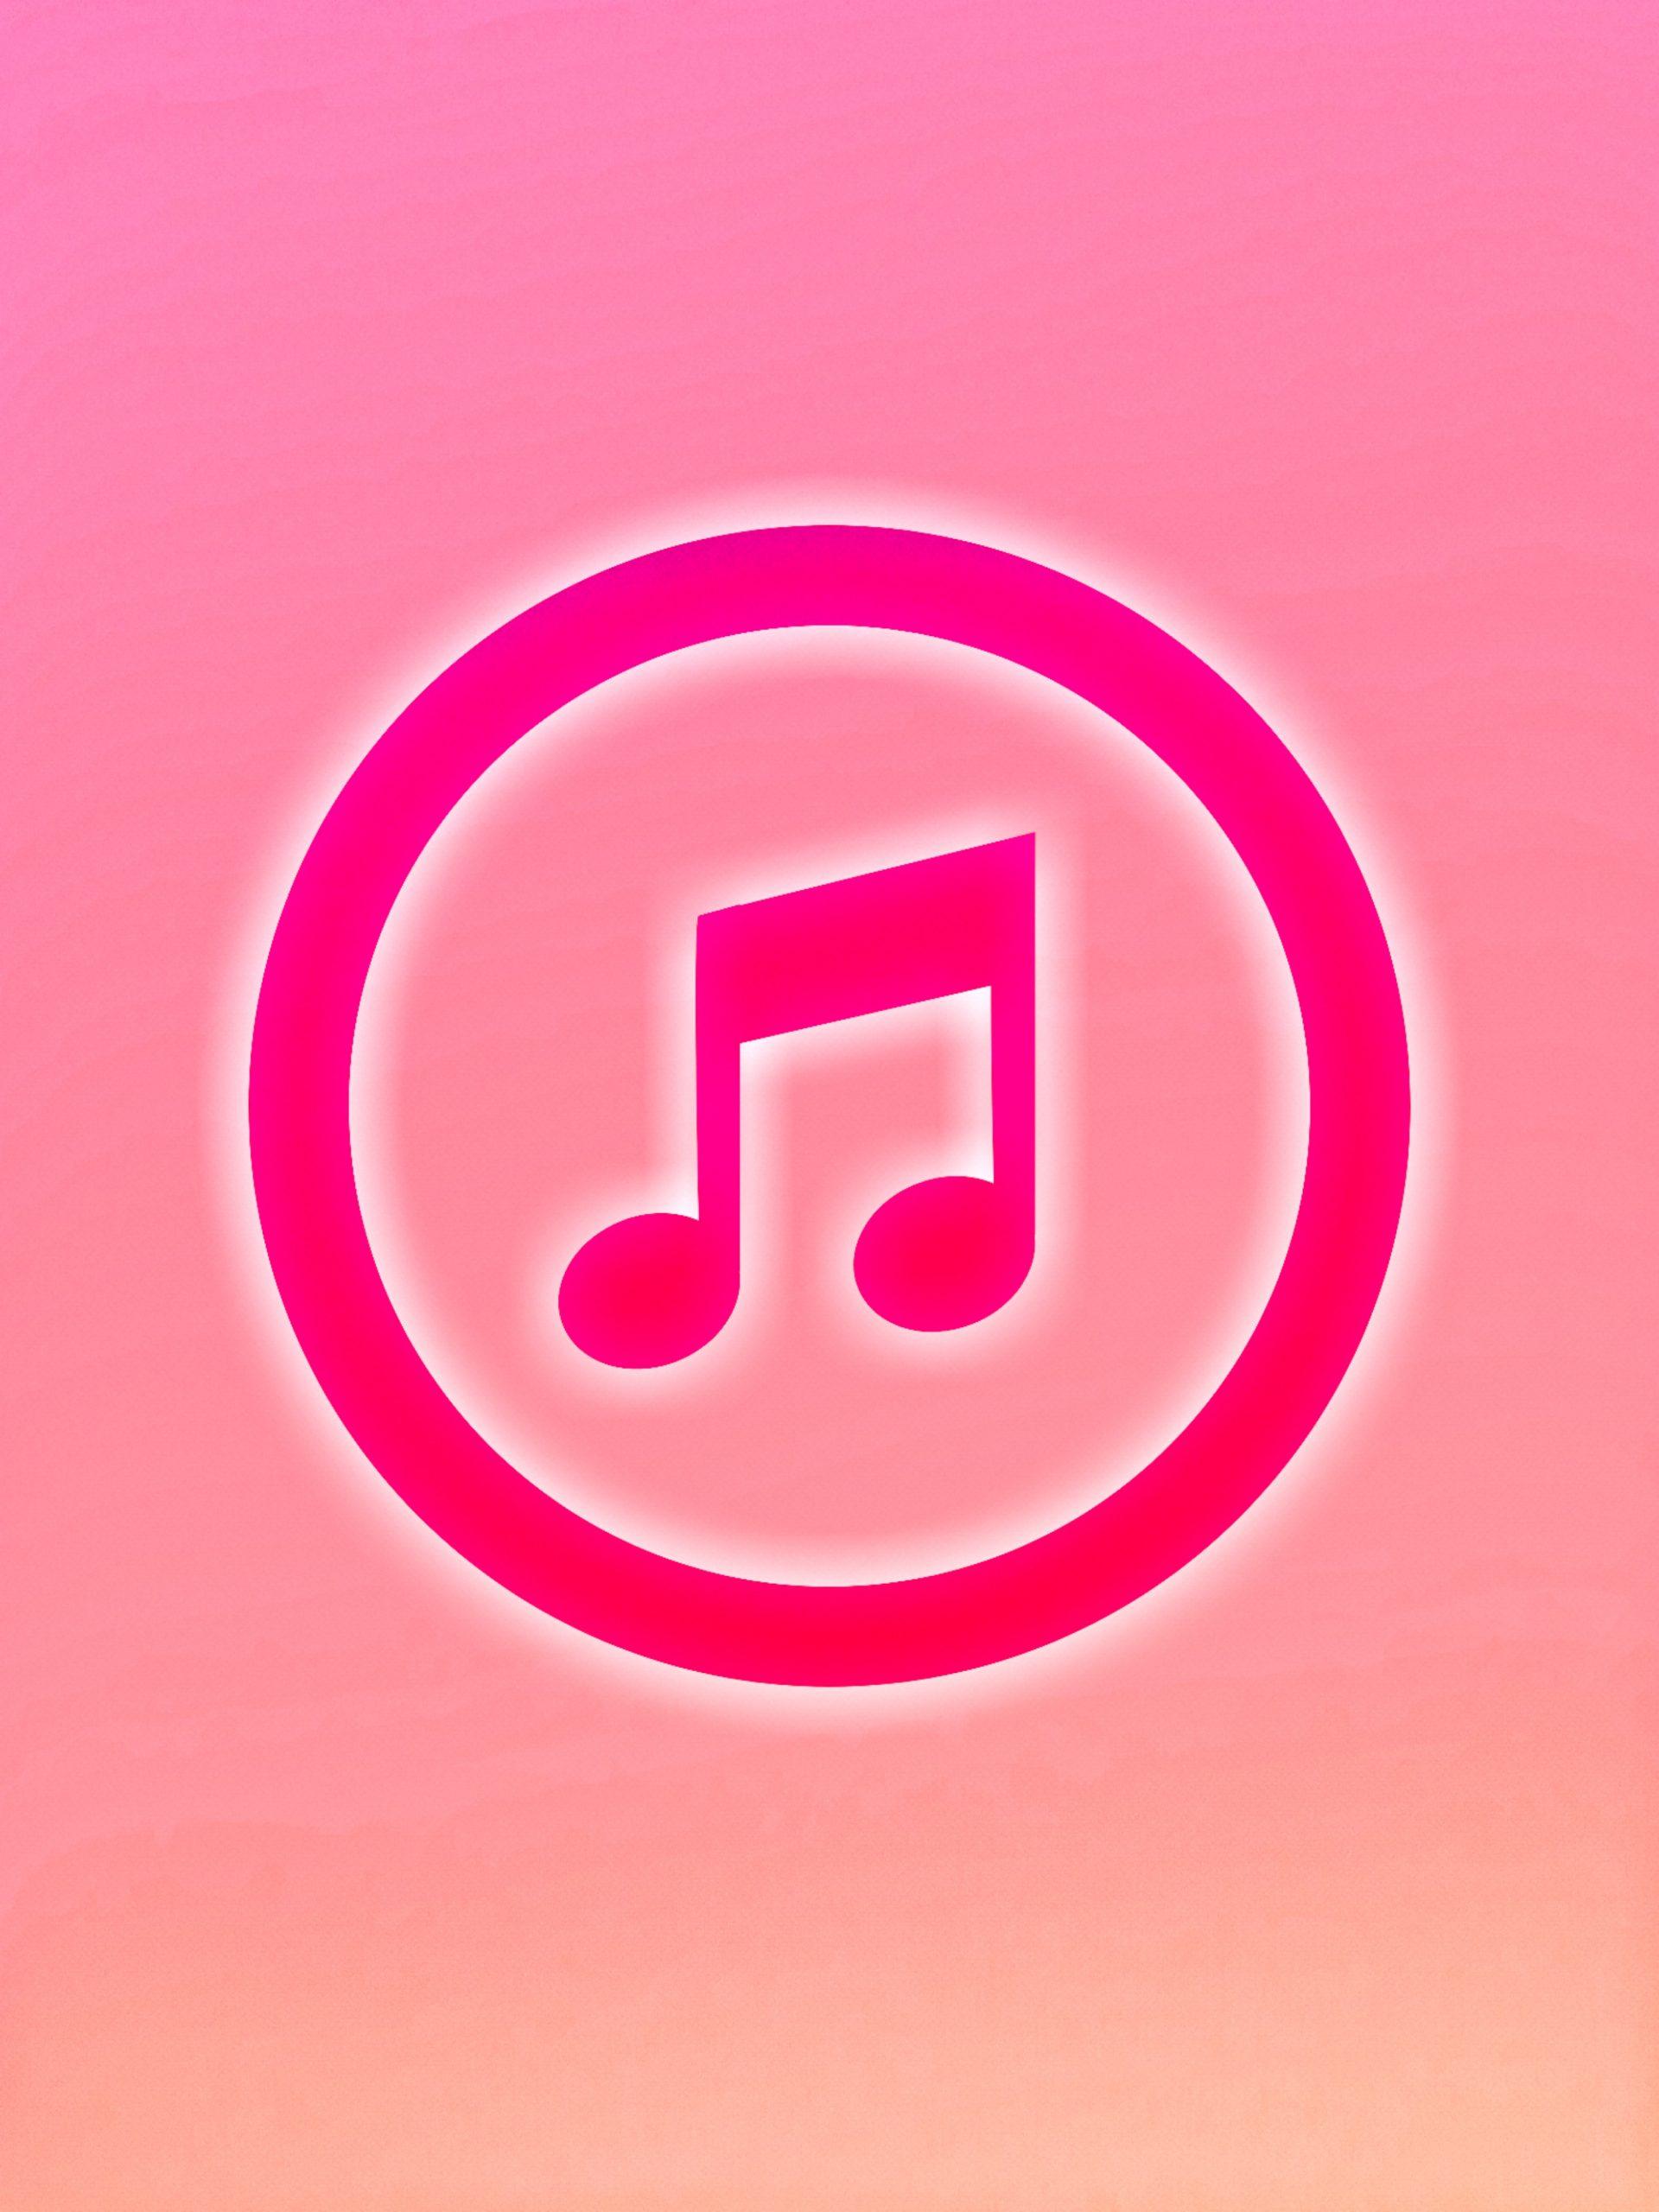 Music sign illustration